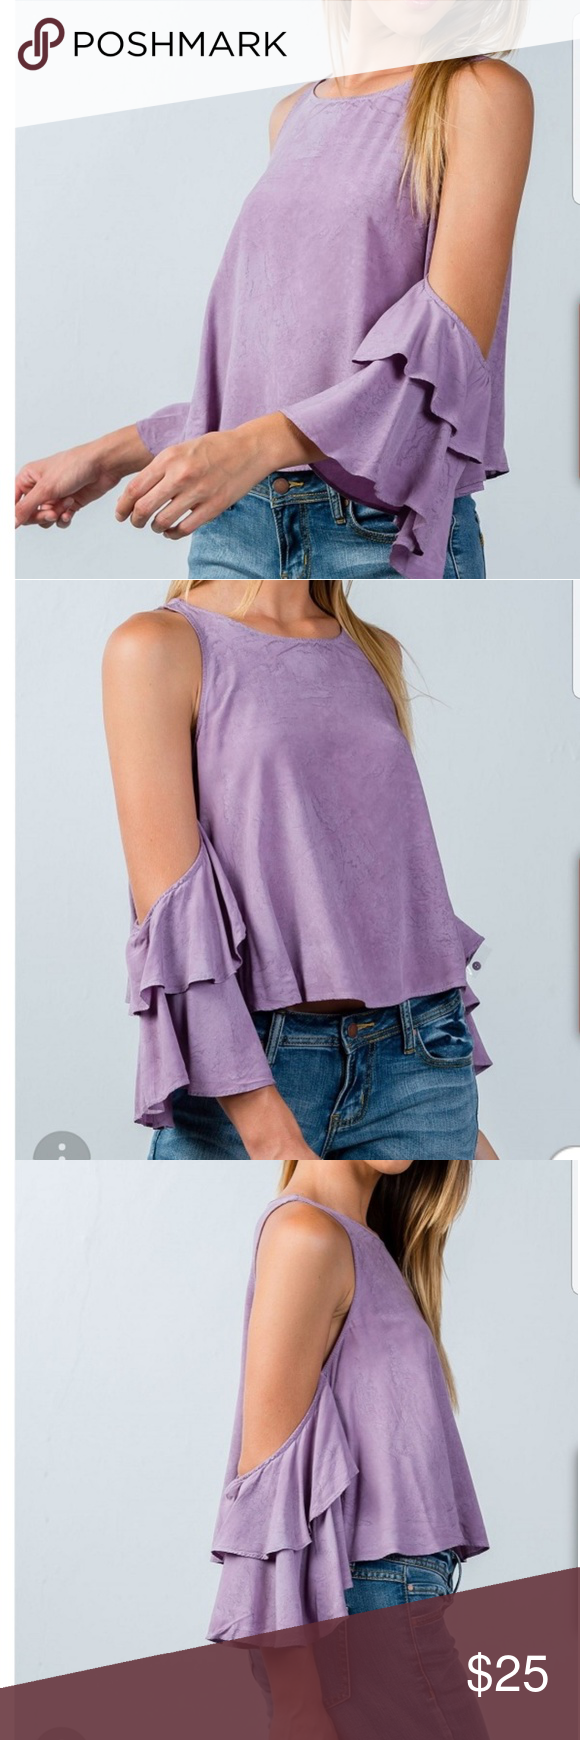 a78d8ec97f58ae Purple Back keyhole open shoulder batwing blouse New purple blouse! Has a back  keyhole and open shoulders. Batwing style sleeves. 100% rayon. Tops Blouses